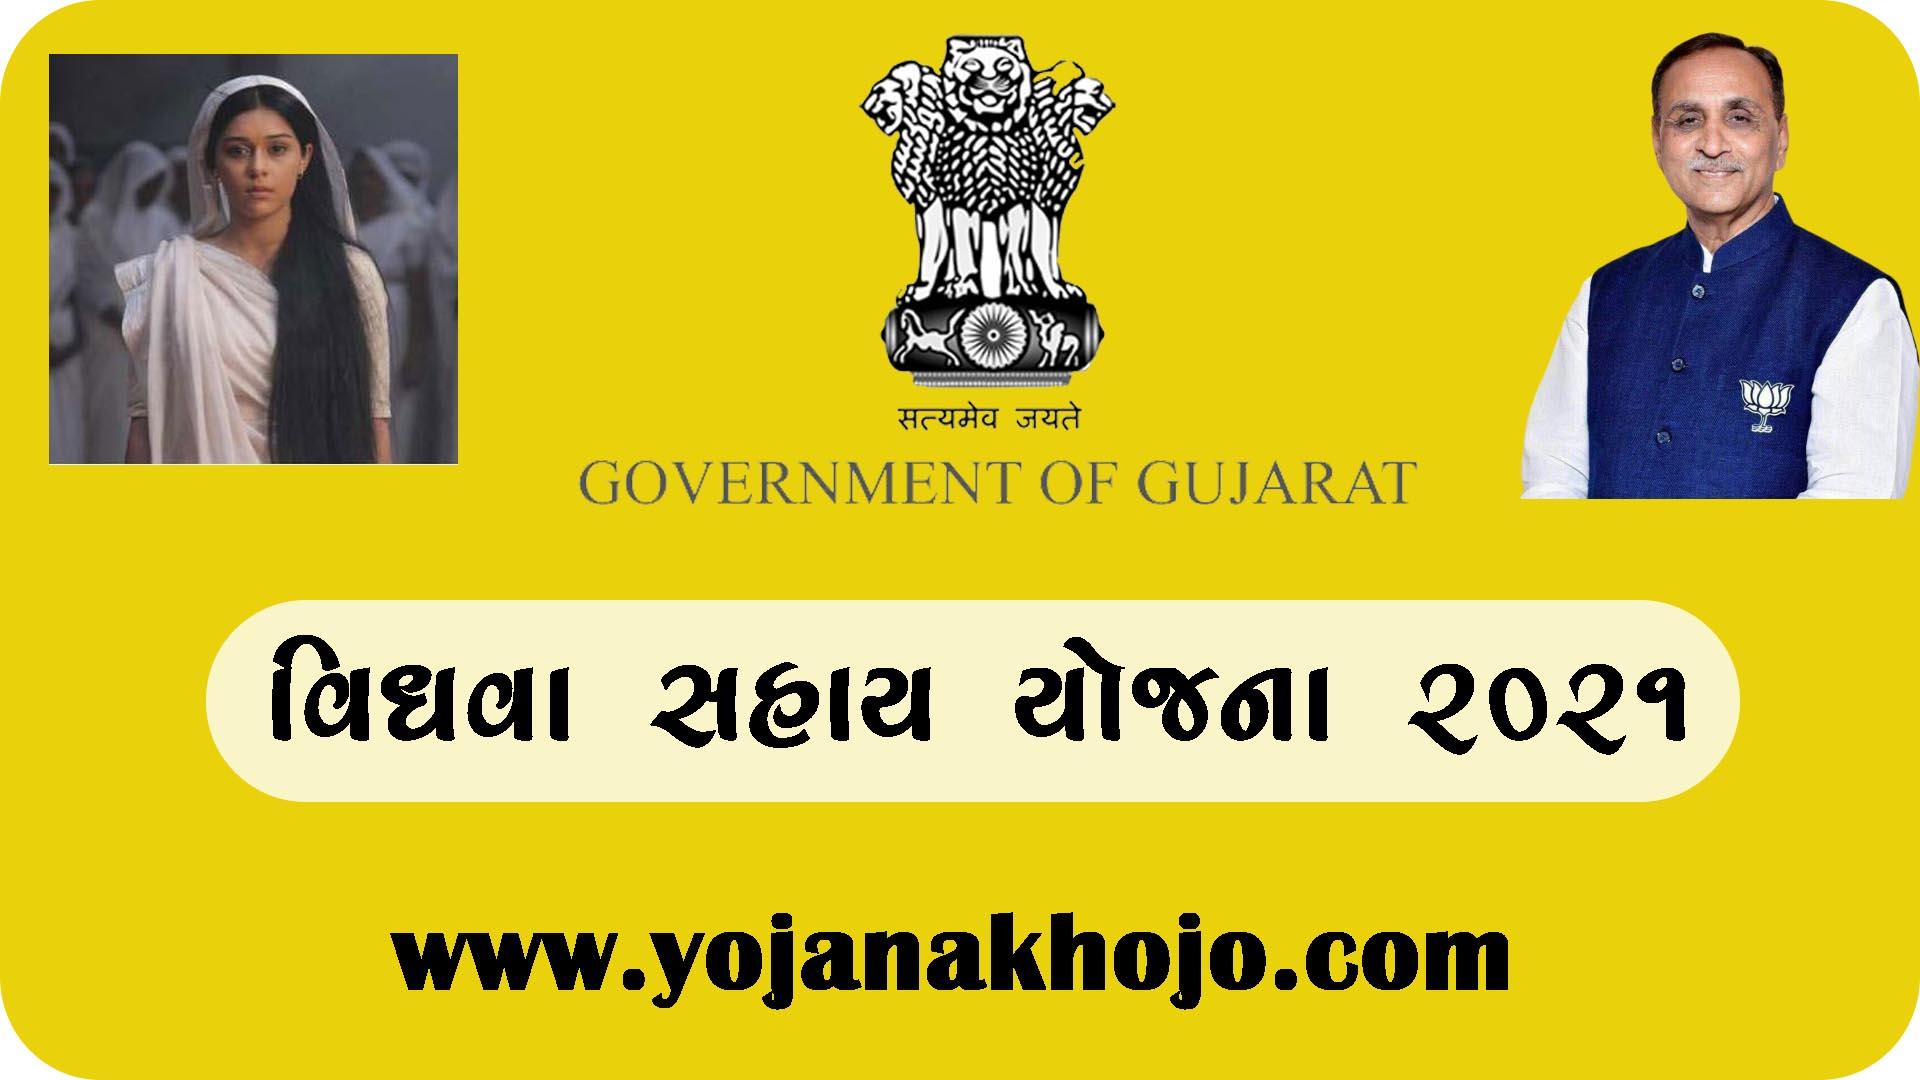 Vidhva Sahay Yojana 2021